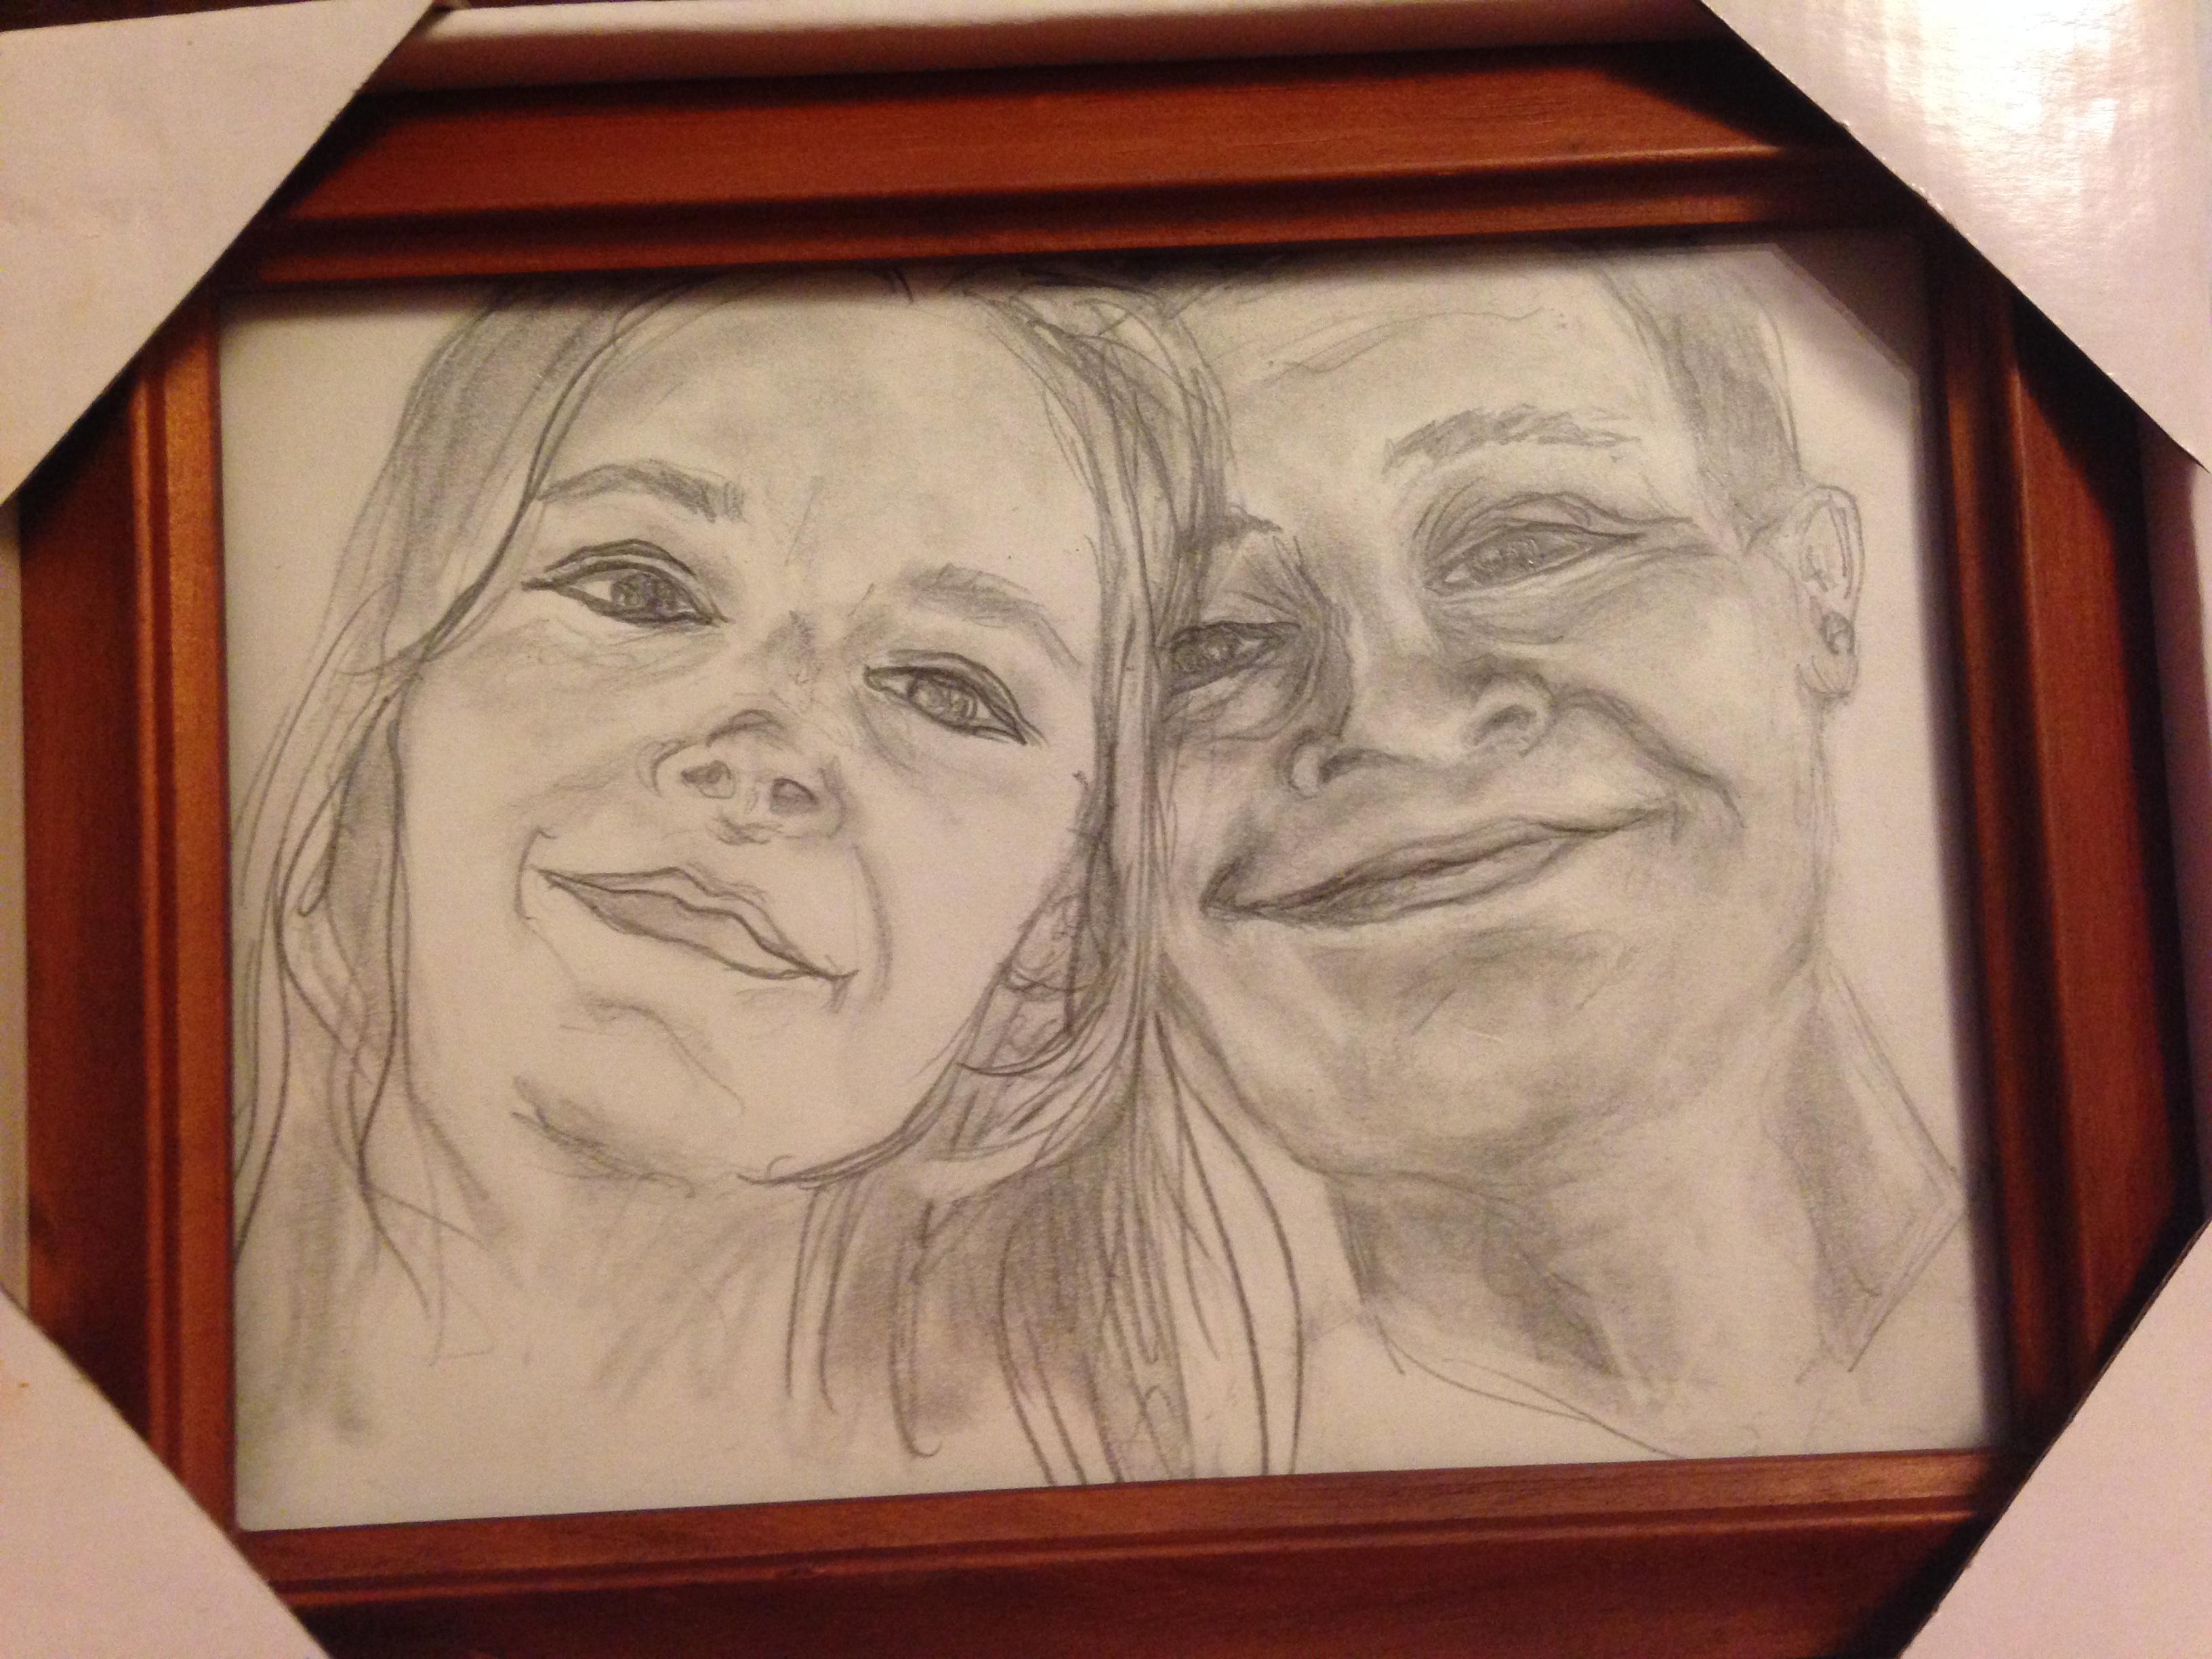 Ania and Daniel